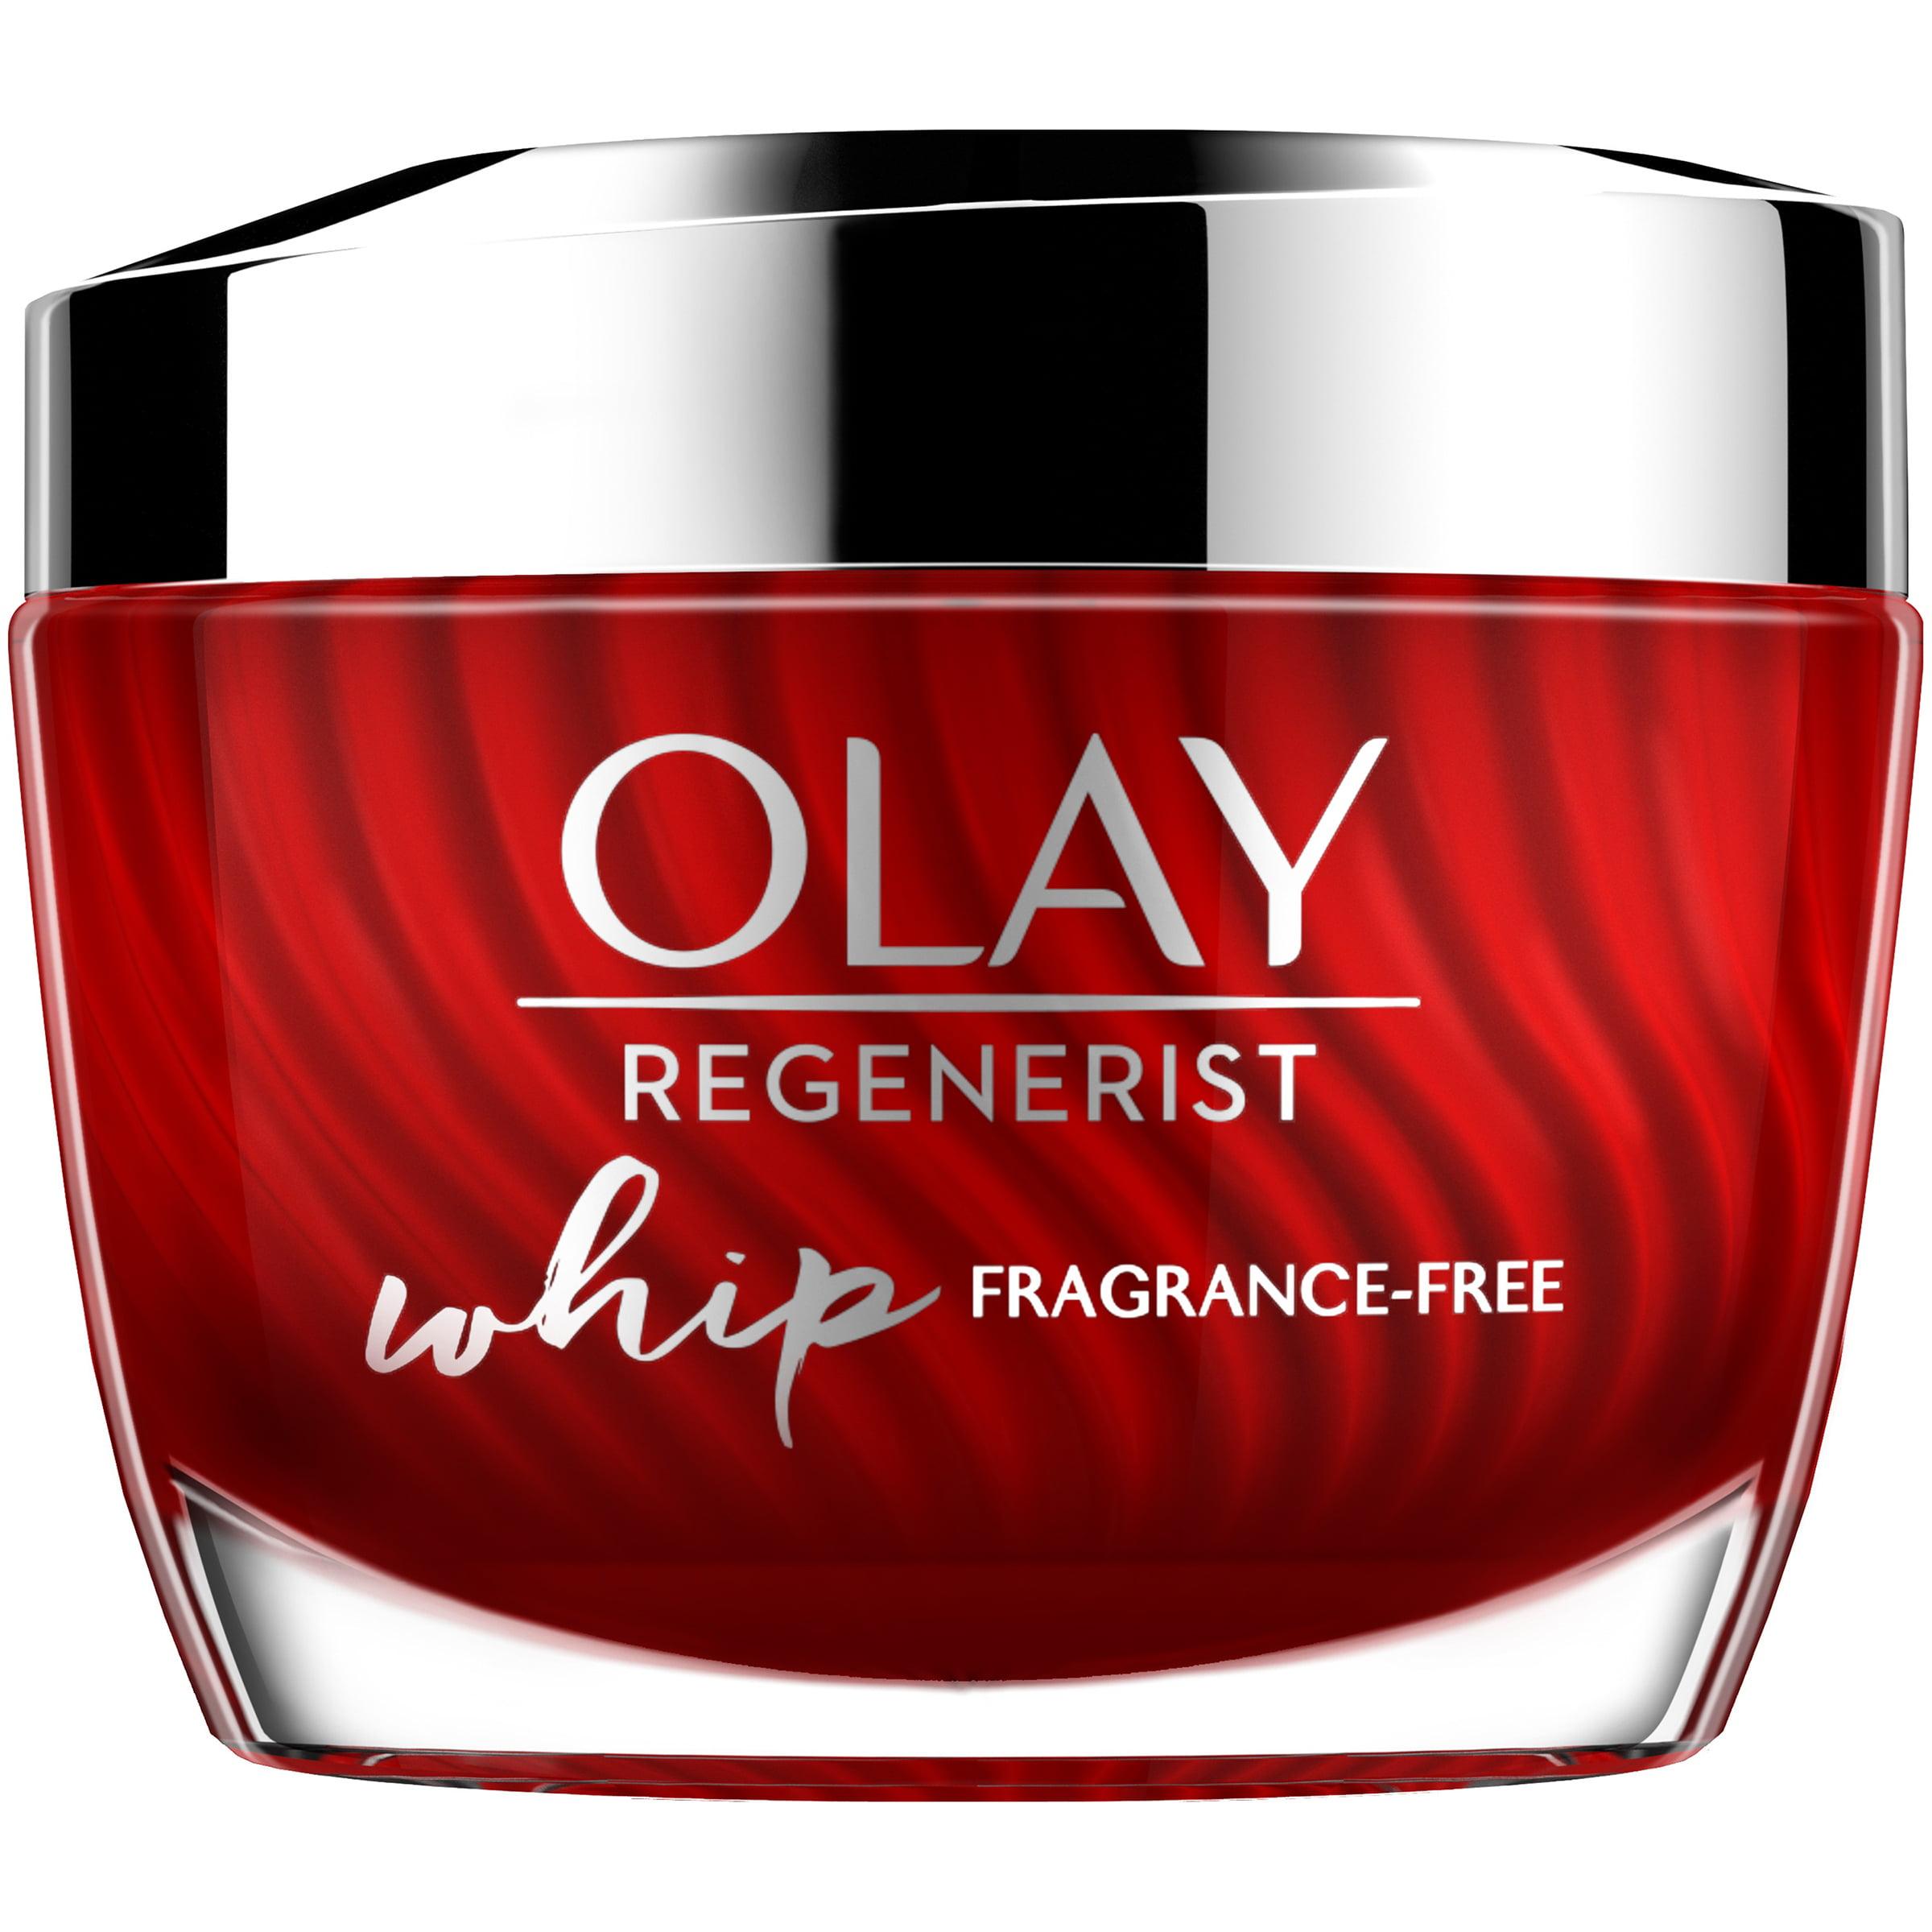 Olay Regenerist Whip Face Moisturizer Fragrance Free 1.7 oz